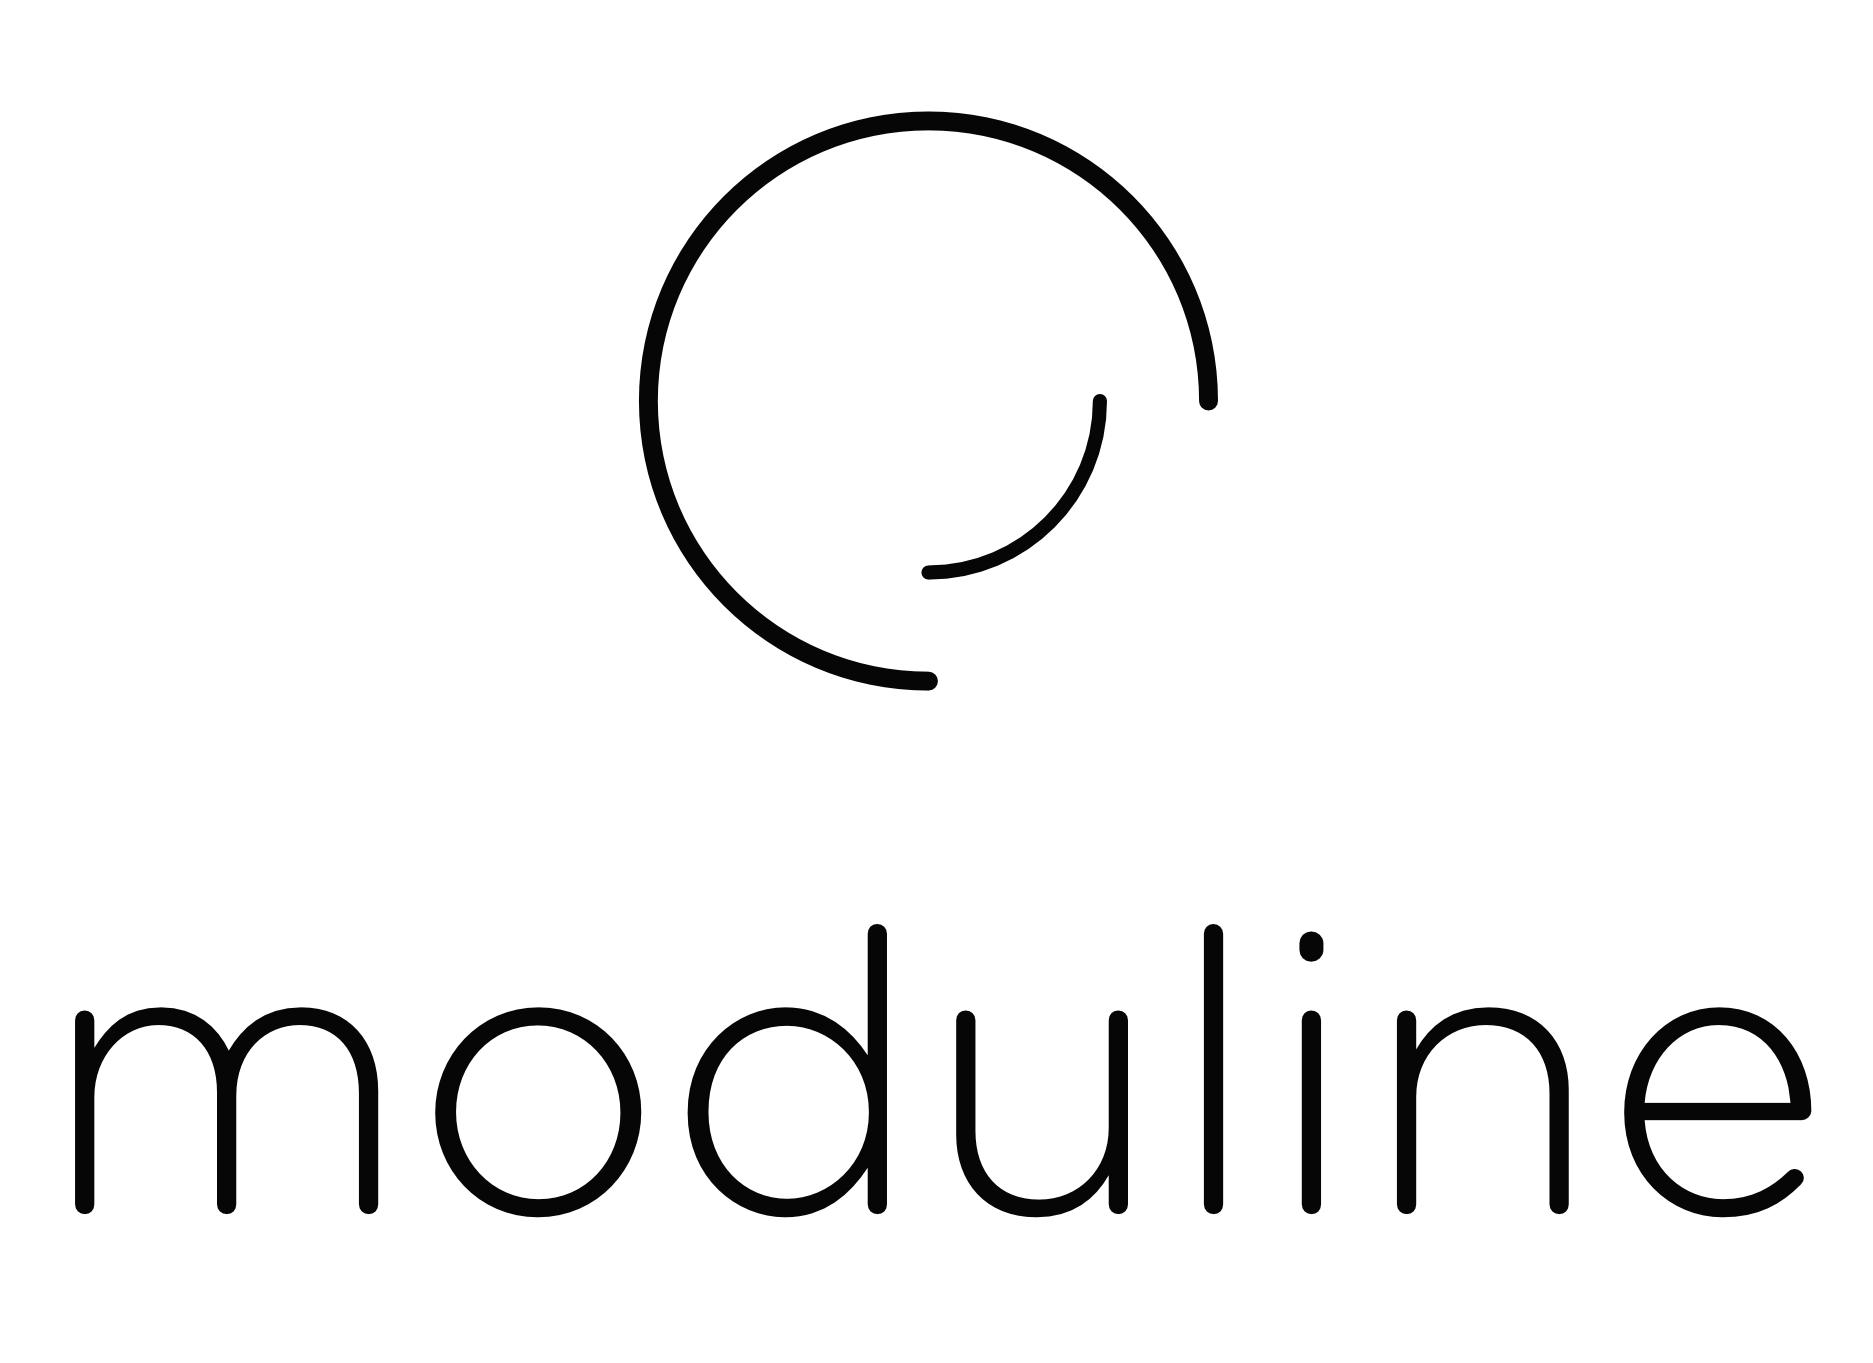 equipement cuisine professionnel - moduline (2) - fourniresto